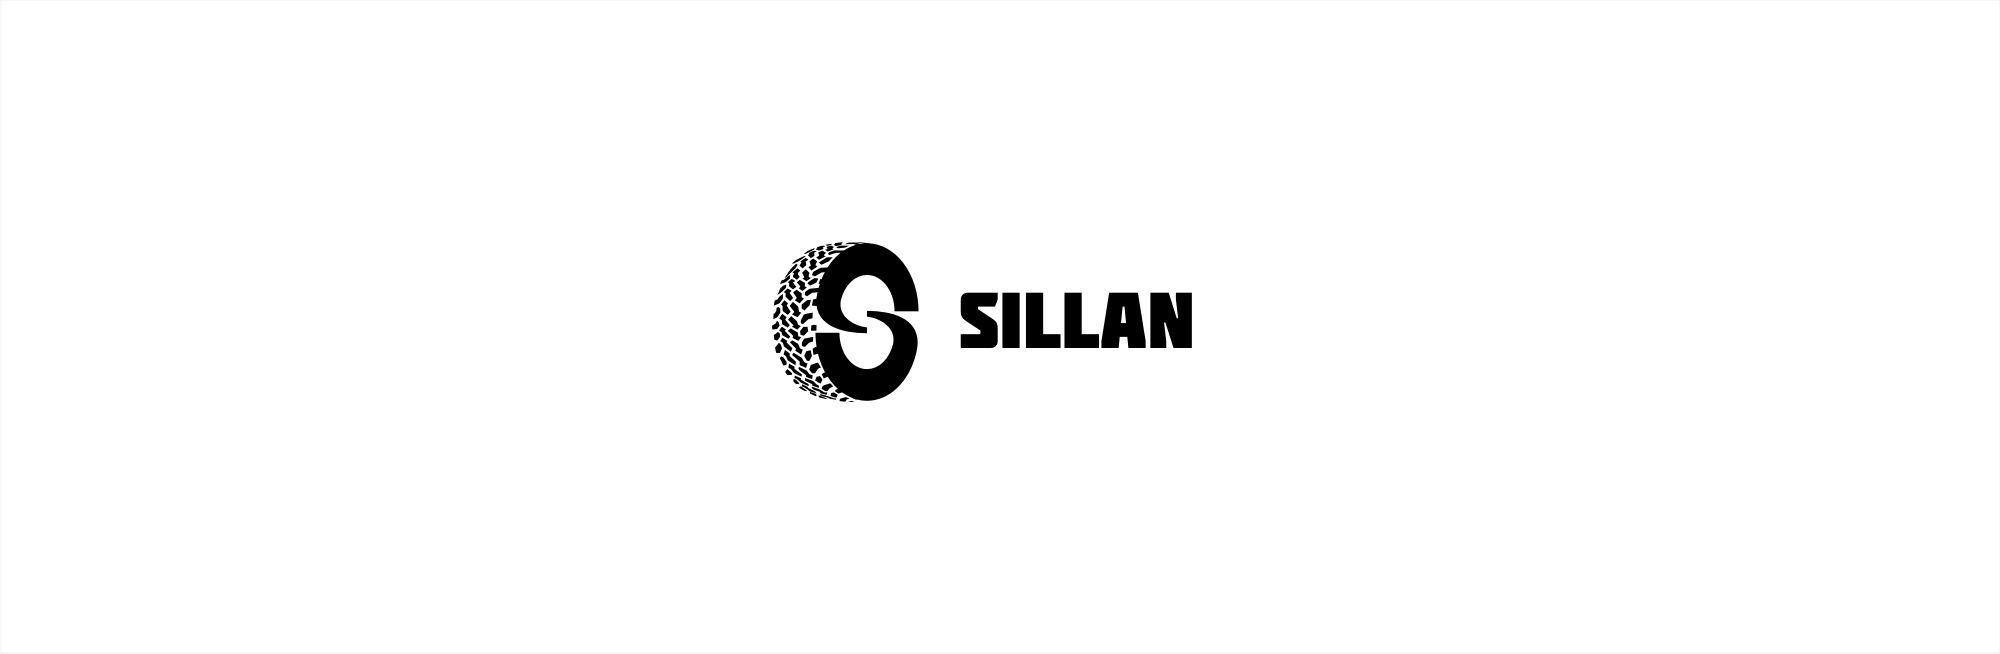 Логотип для Sillan - дизайнер blessergy